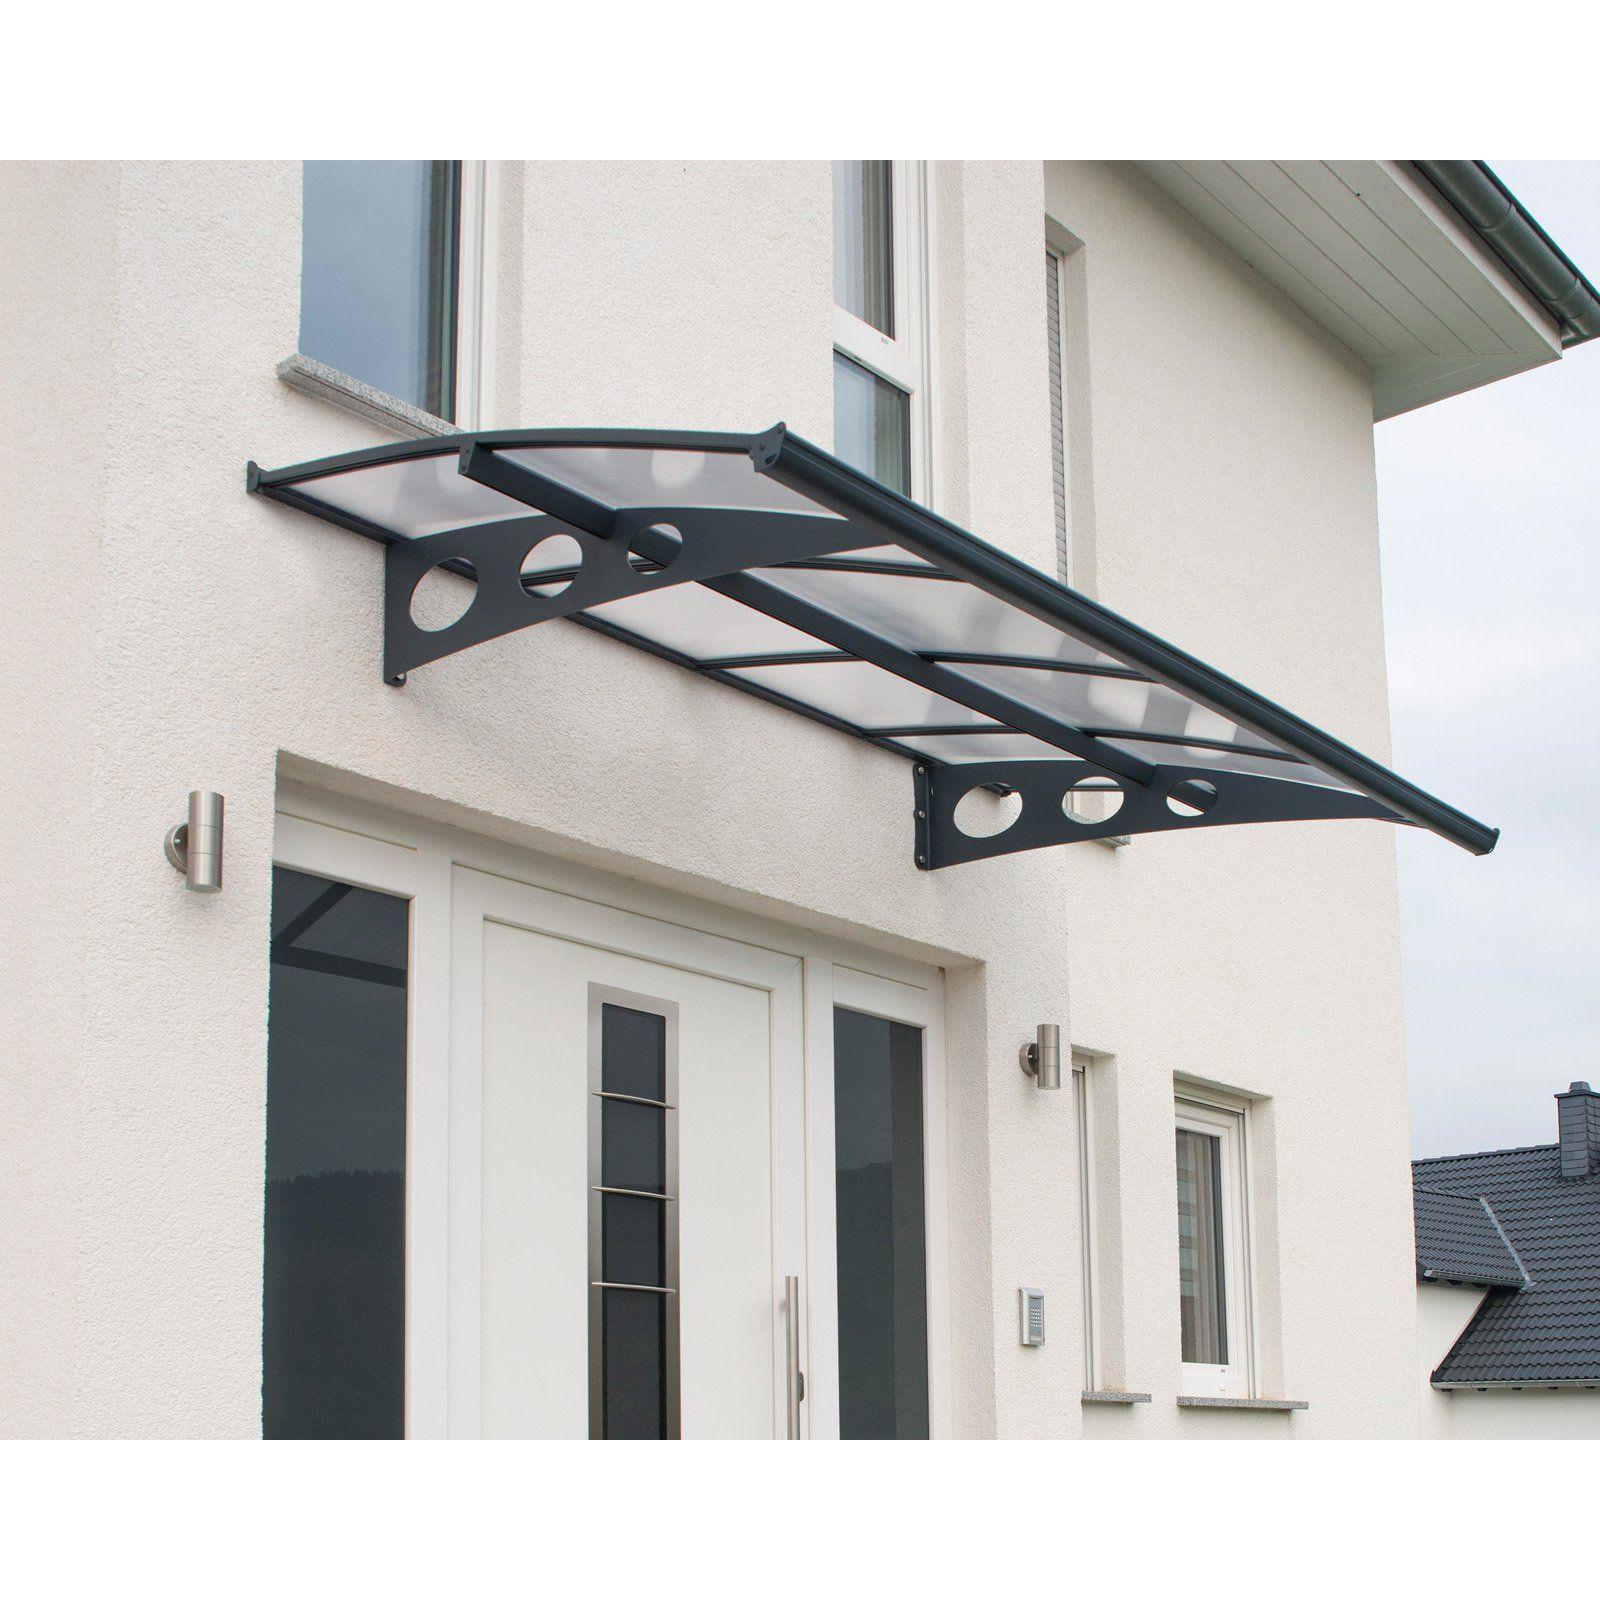 Palram Herald 2230 7 33 X 4 56 Ft Awning Door Awnings Door Canopy Polycarbonate Roof Panels